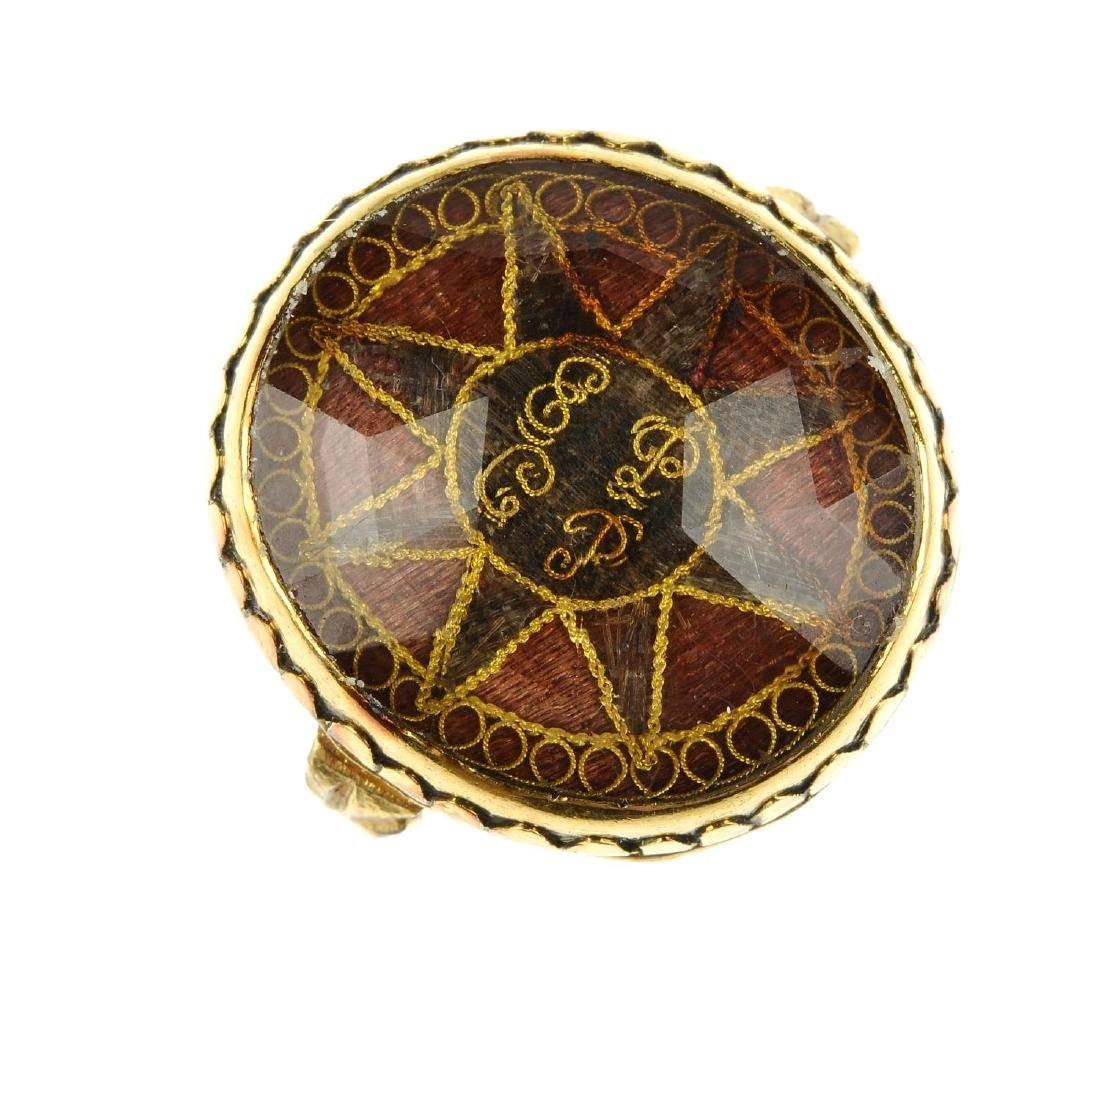 An early Georgian 'Stuart' rock crystal gold and hair